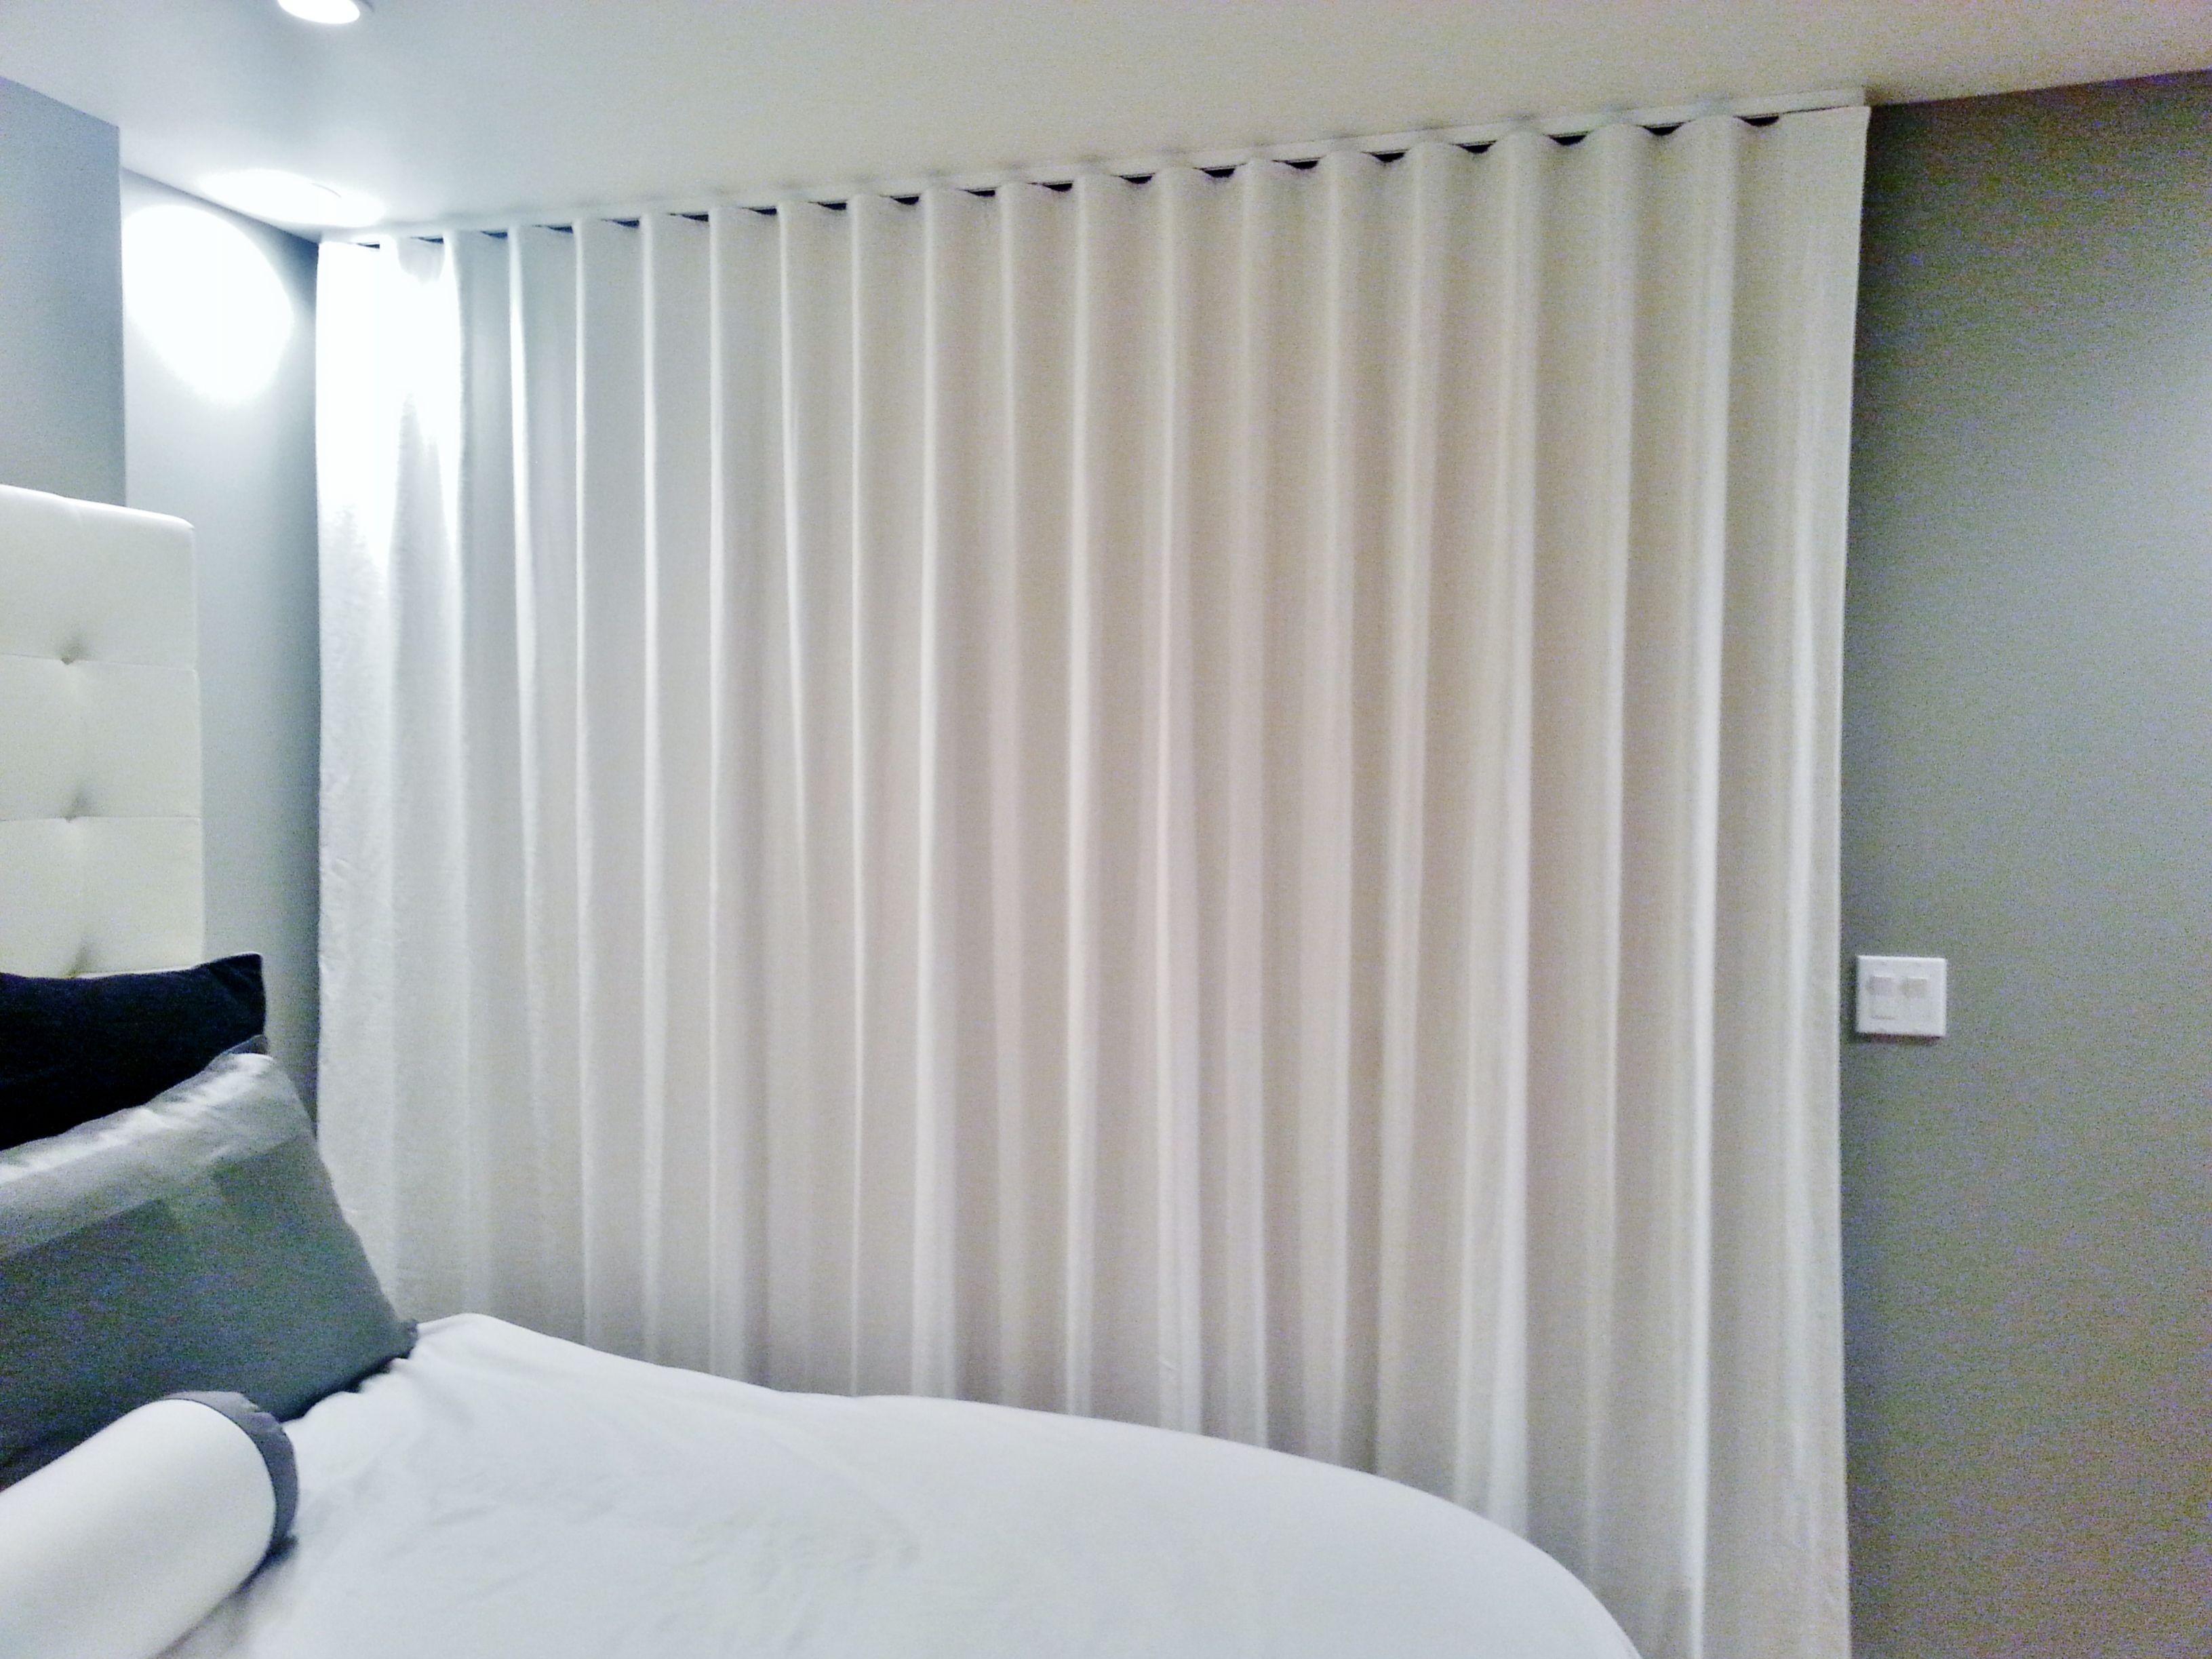 Ripplefold drapery panels on ceiling mounted architrac rod